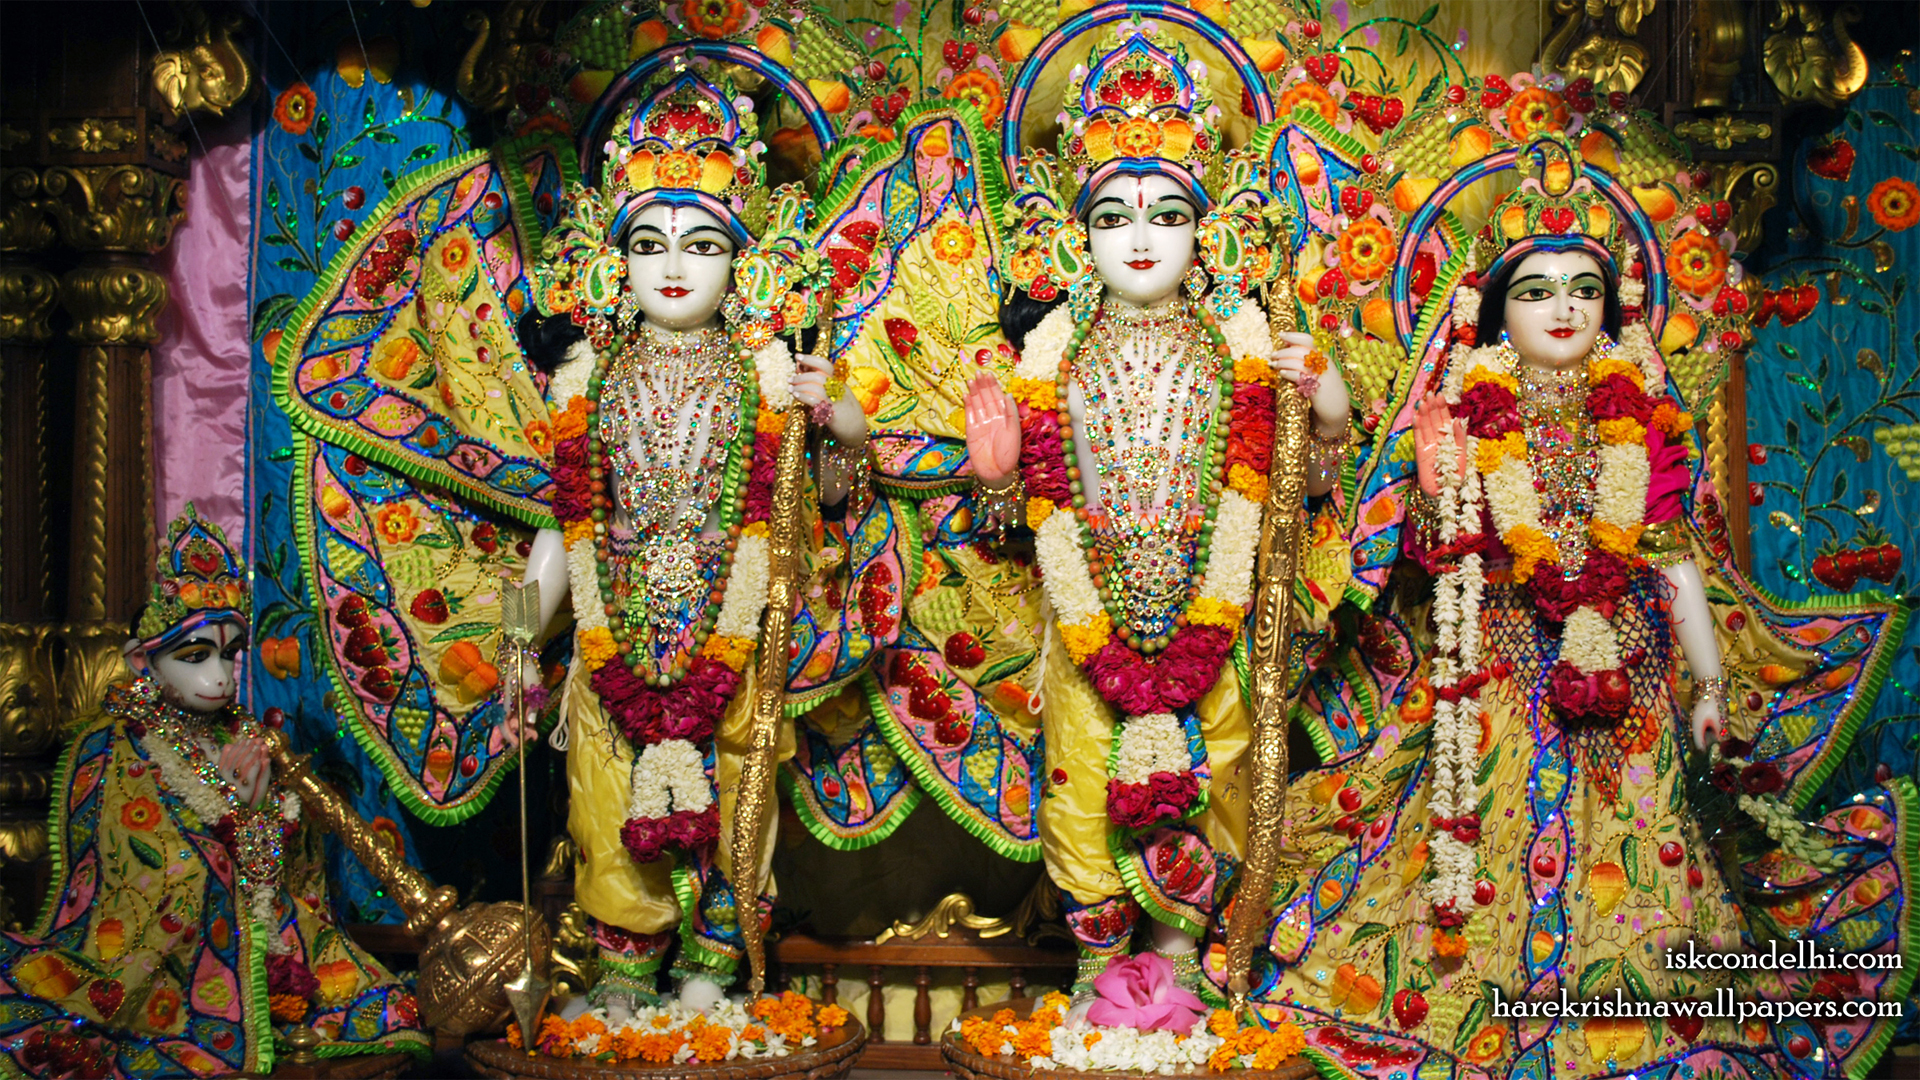 Sri Sri Sita Rama Laxman Hanuman Wallpaper (011) Size 1920x1080 Download